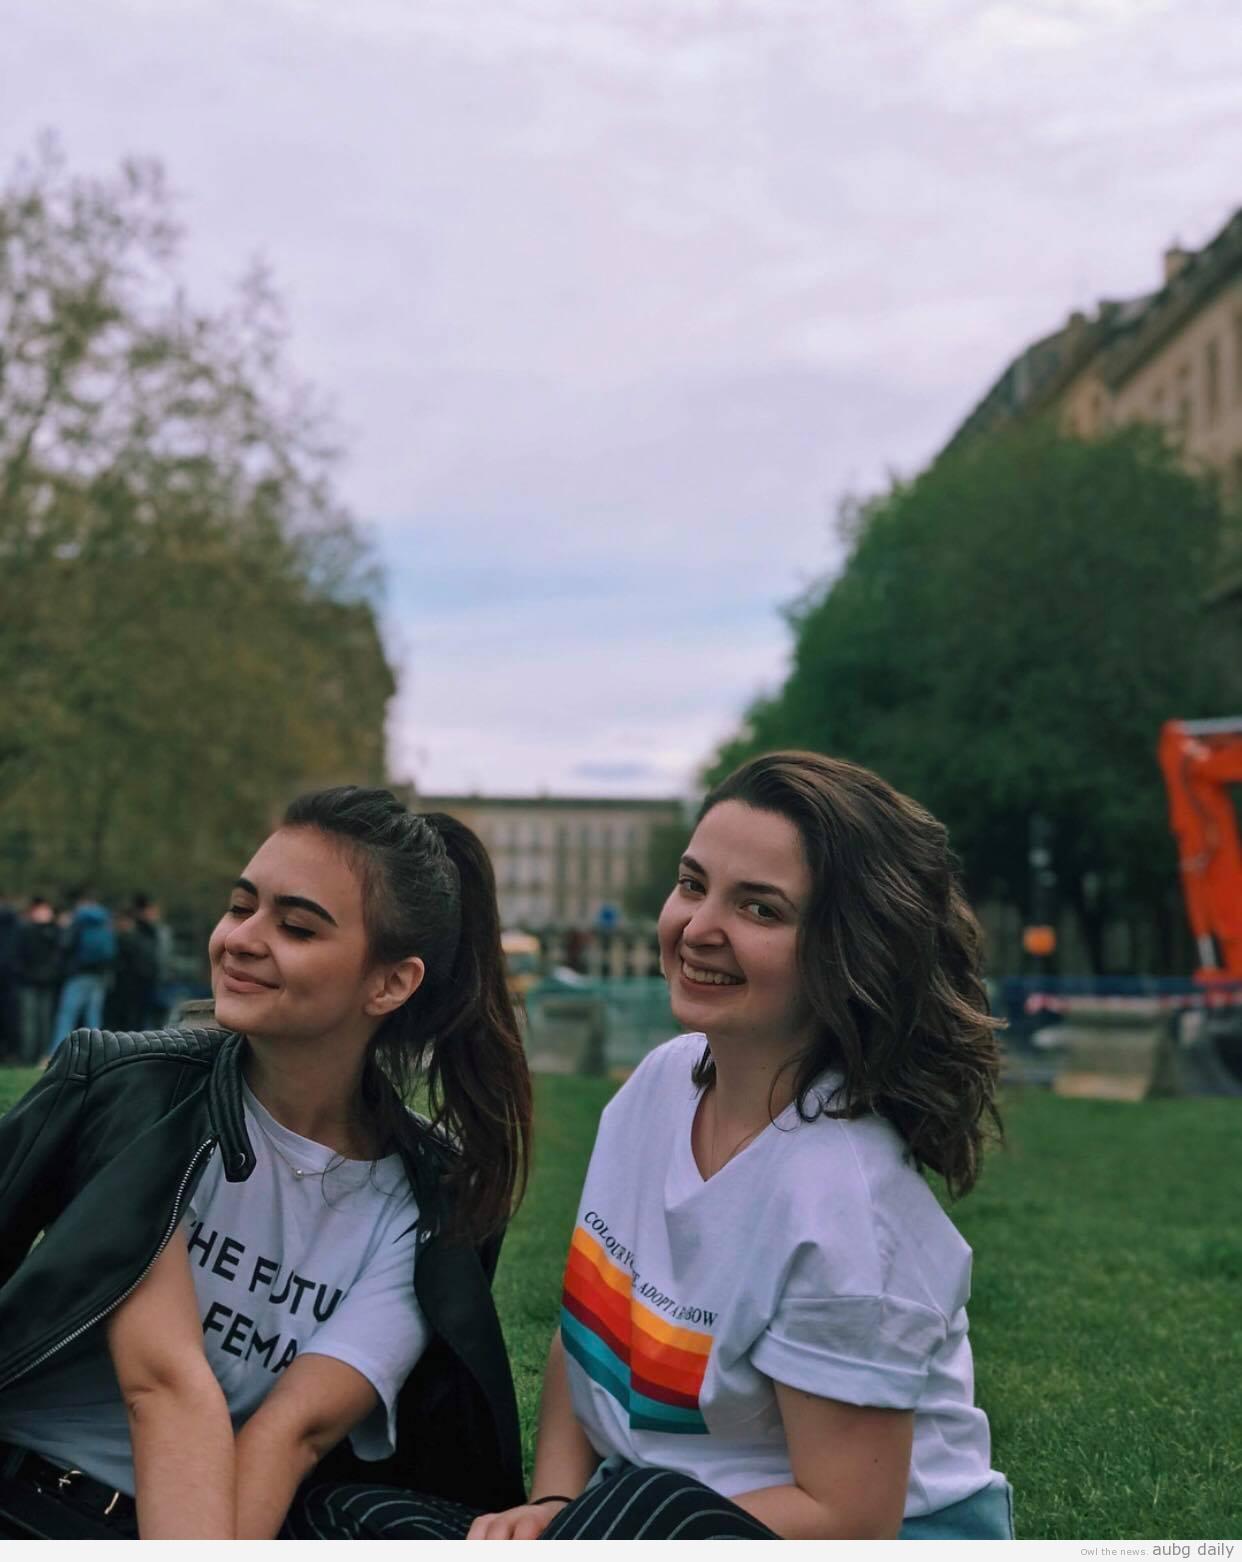 Experiences on Erasmus at Science Po Bordeaux